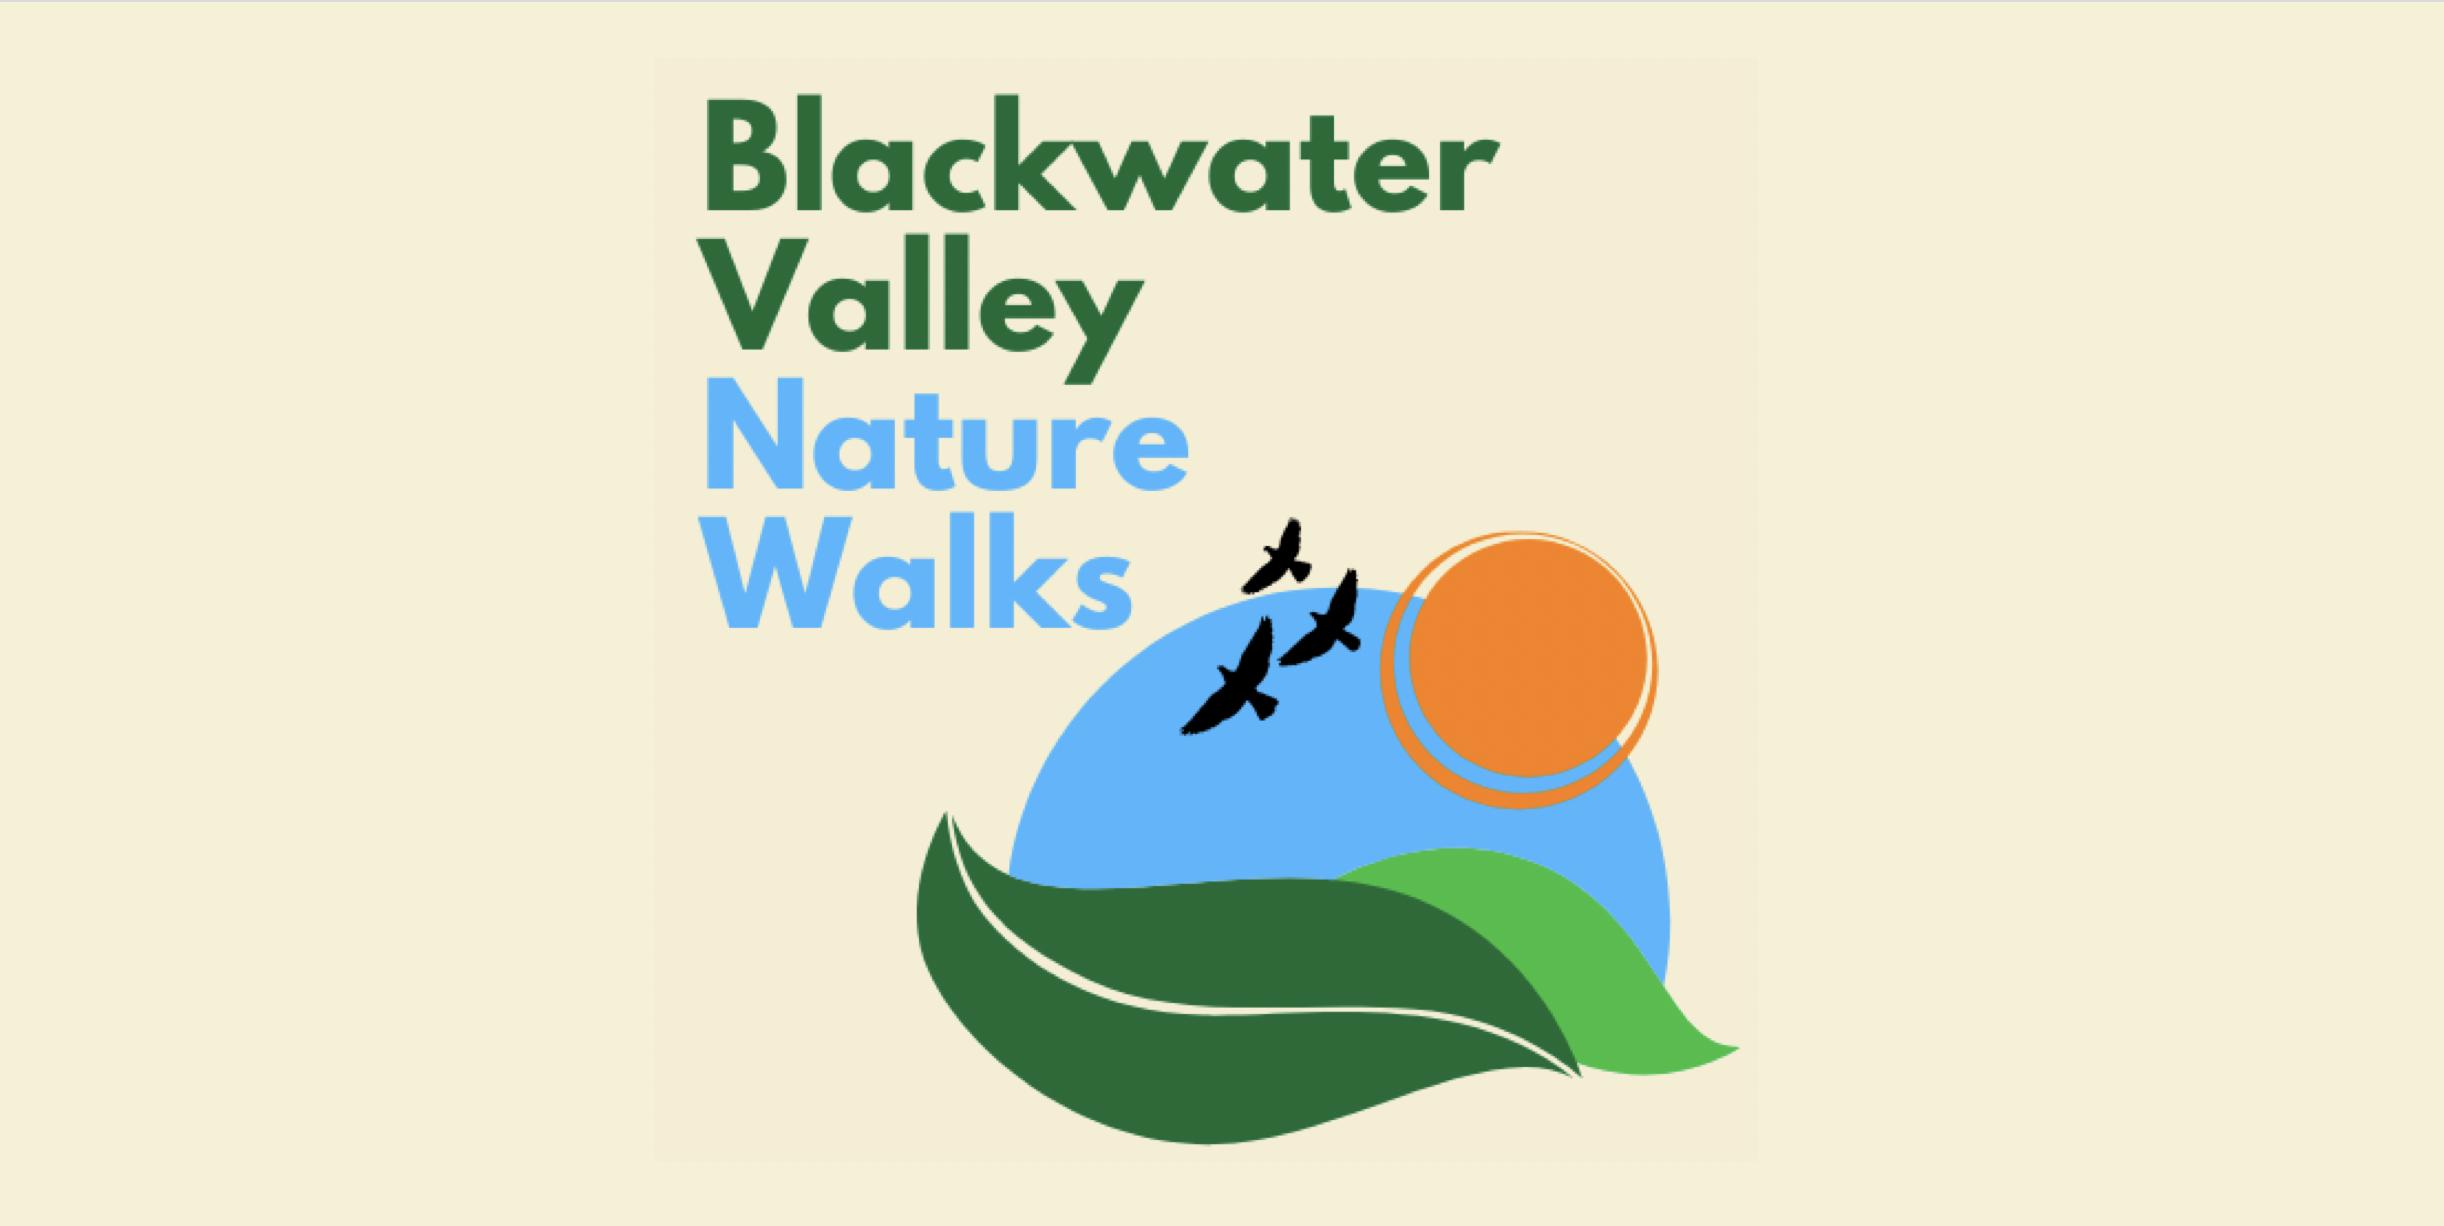 Blackwater Valley Nature Walks logo